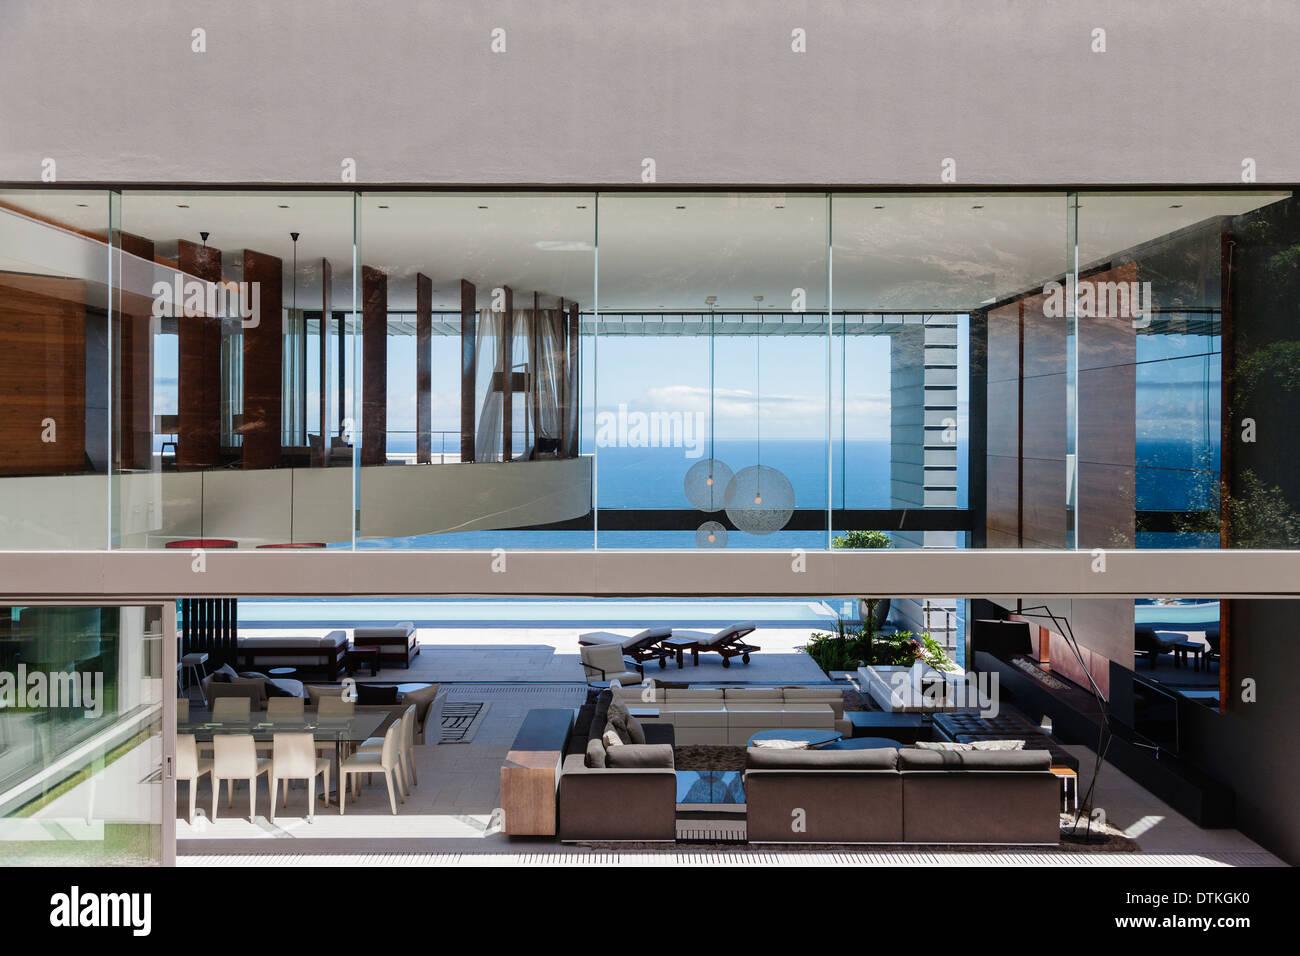 Glass walls of modern house overlooking ocean - Stock Image